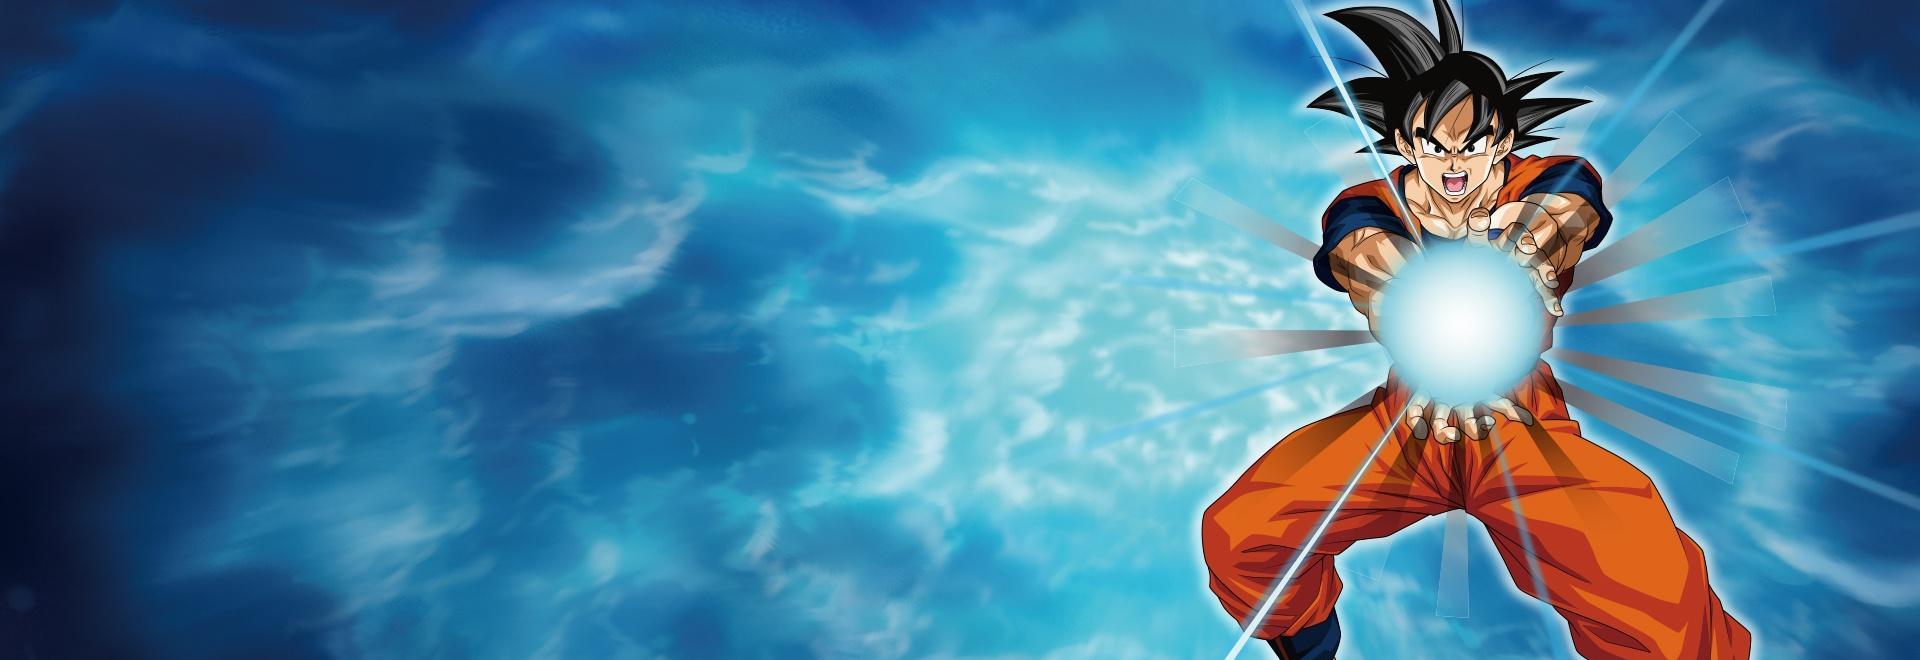 Il potere del Super Saiyan God